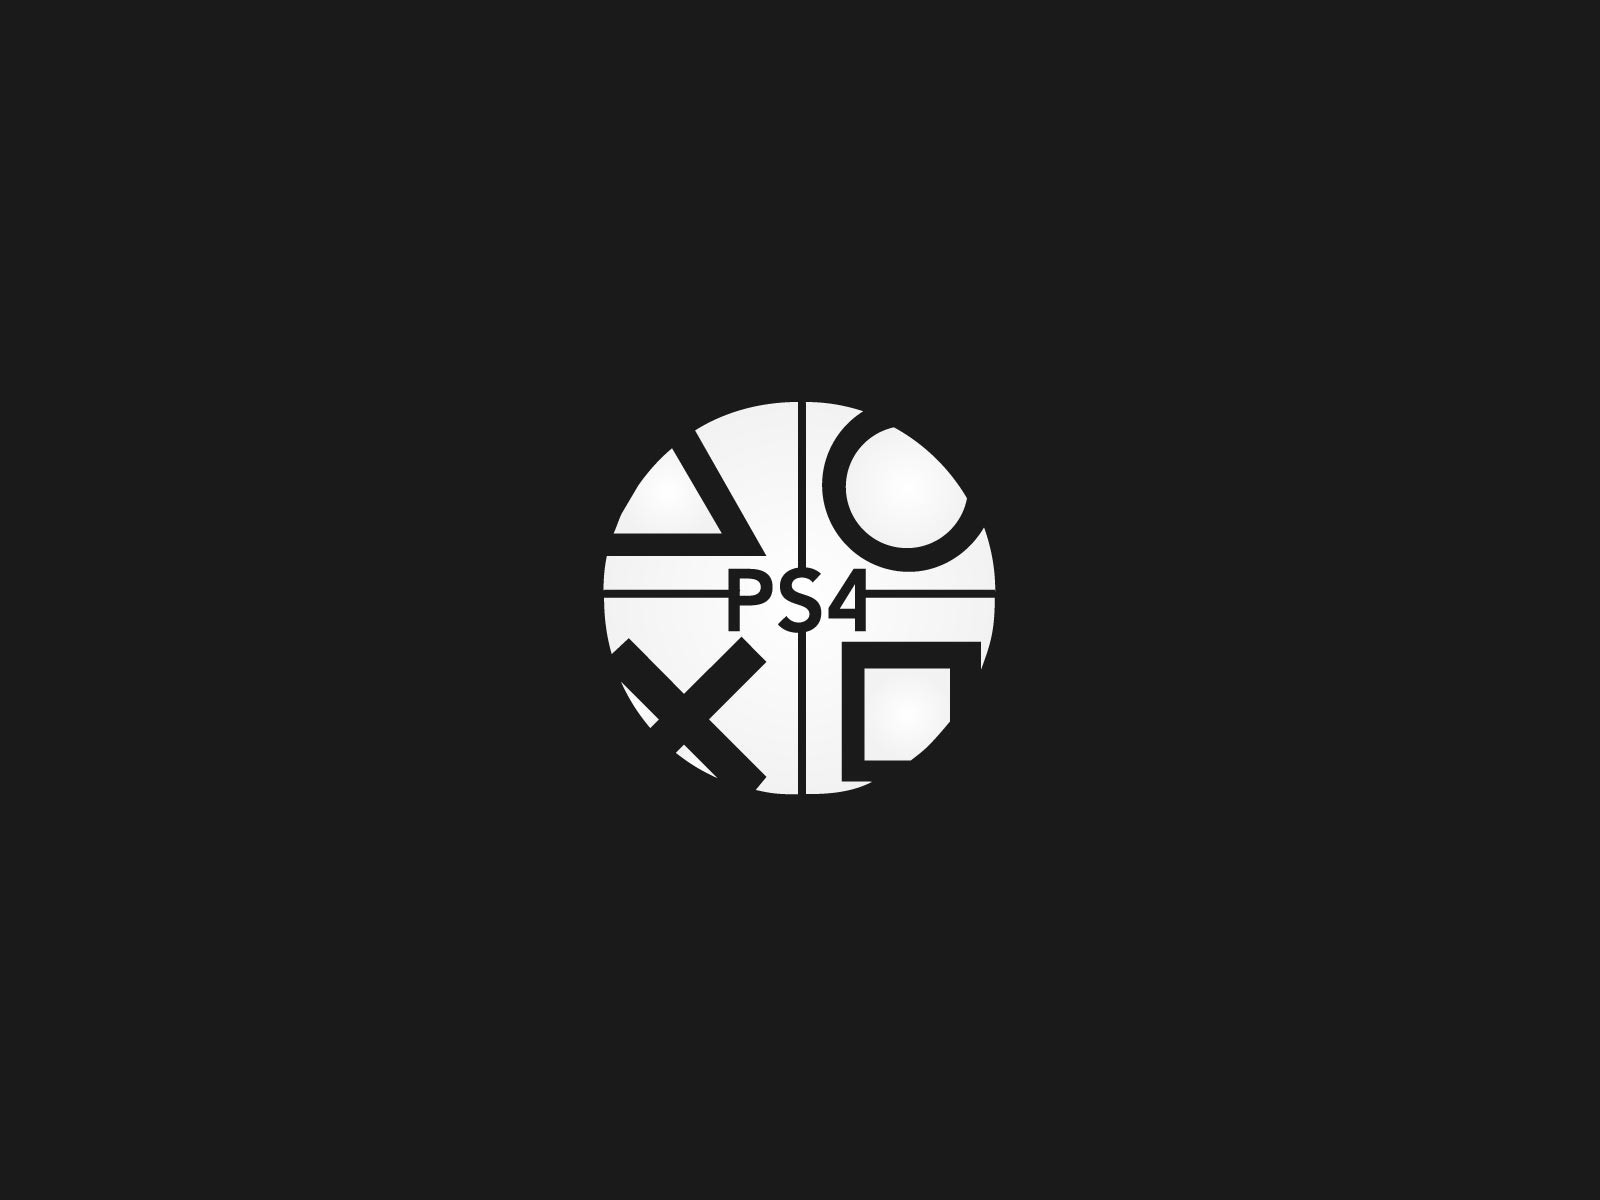 PS4 - 007